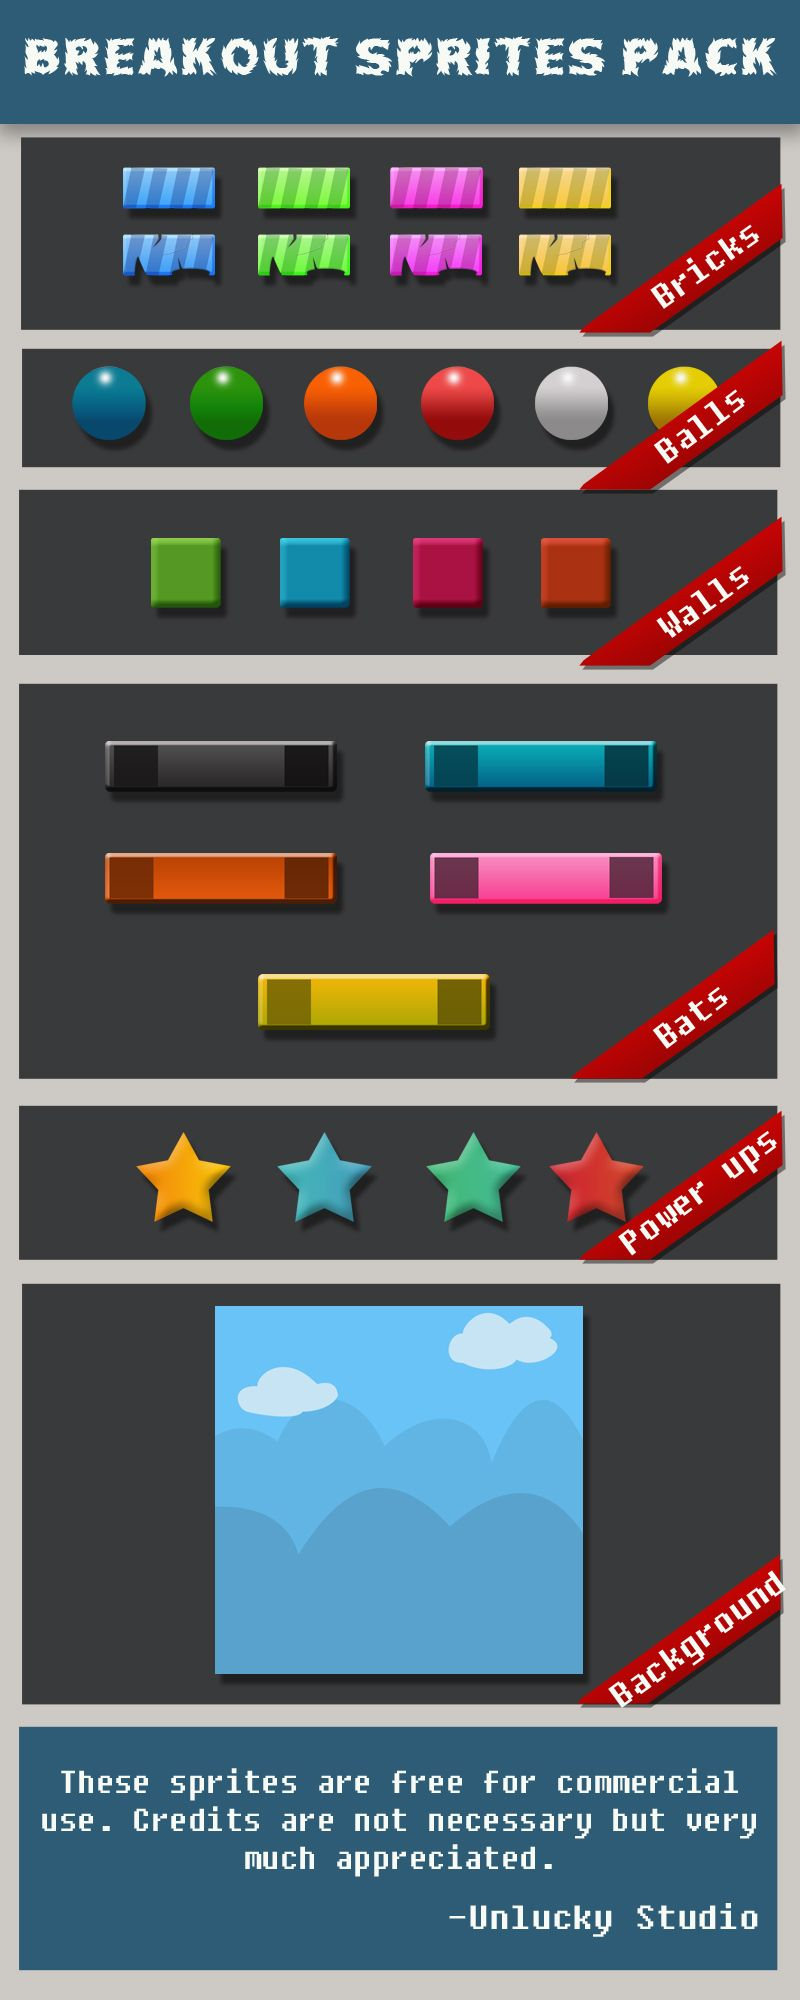 Download Free games sprites Breakout game sprite pack